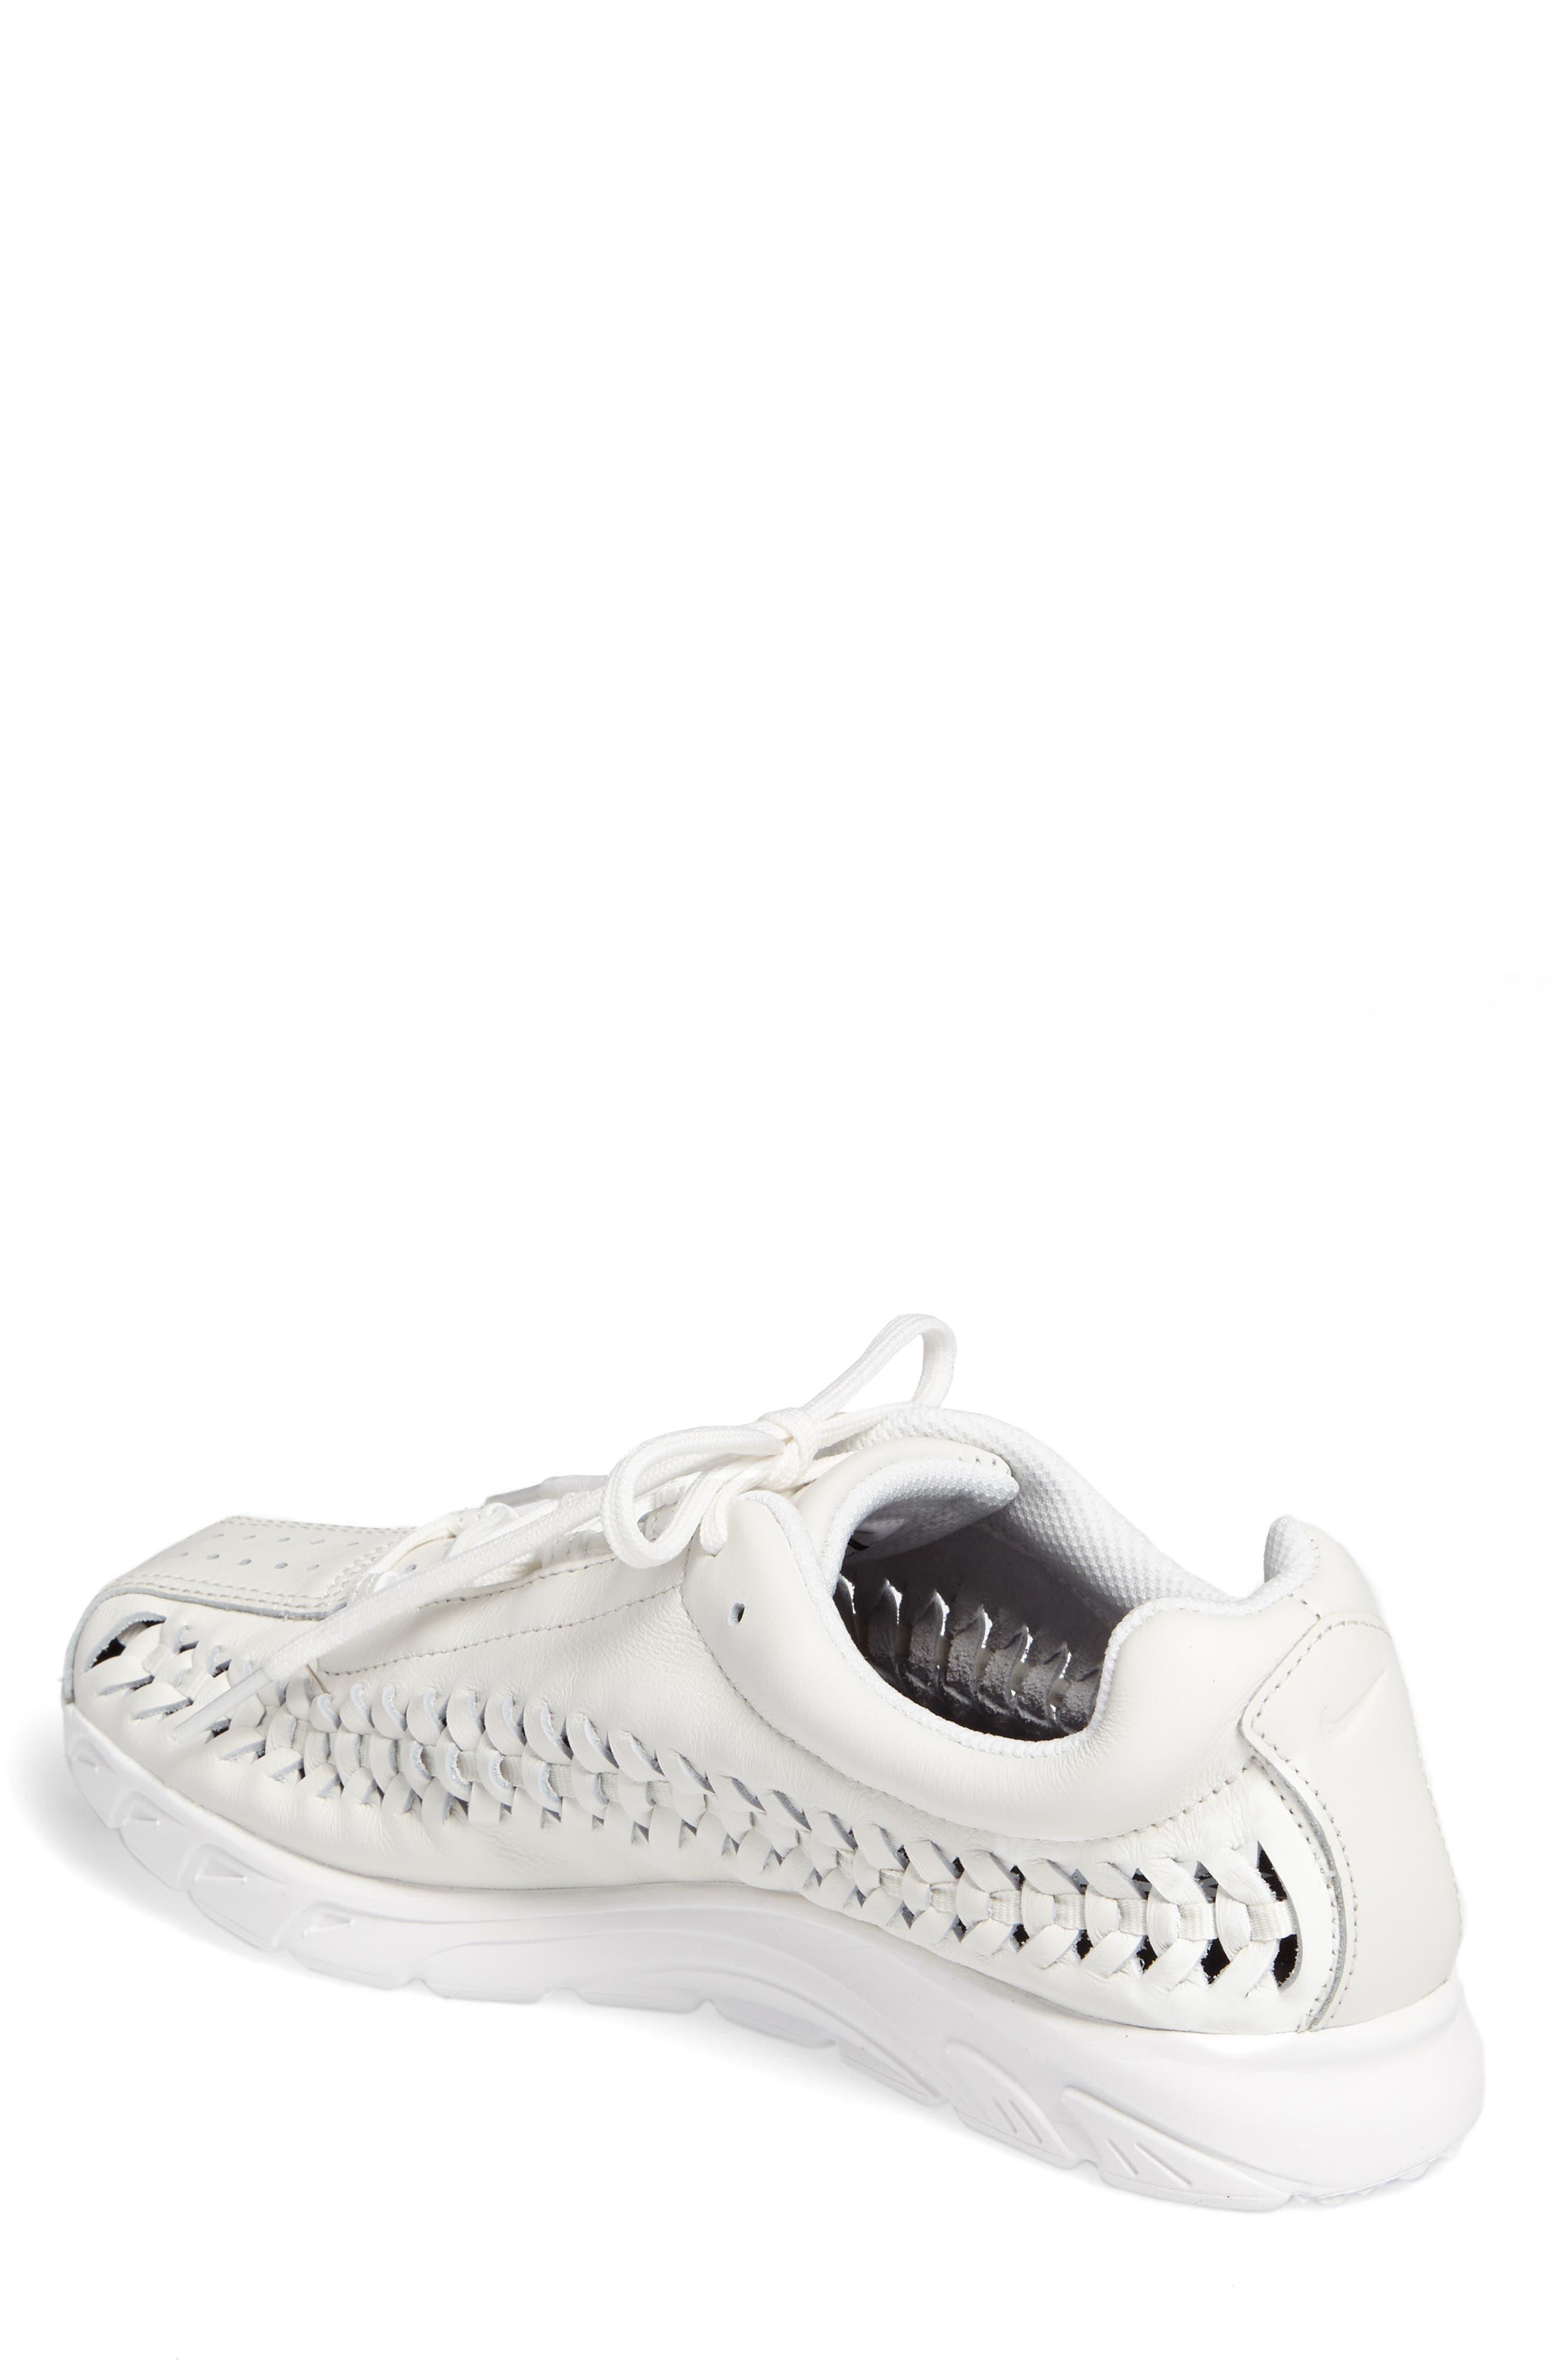 'Mayfly' Sneaker,                             Alternate thumbnail 2, color,                             100